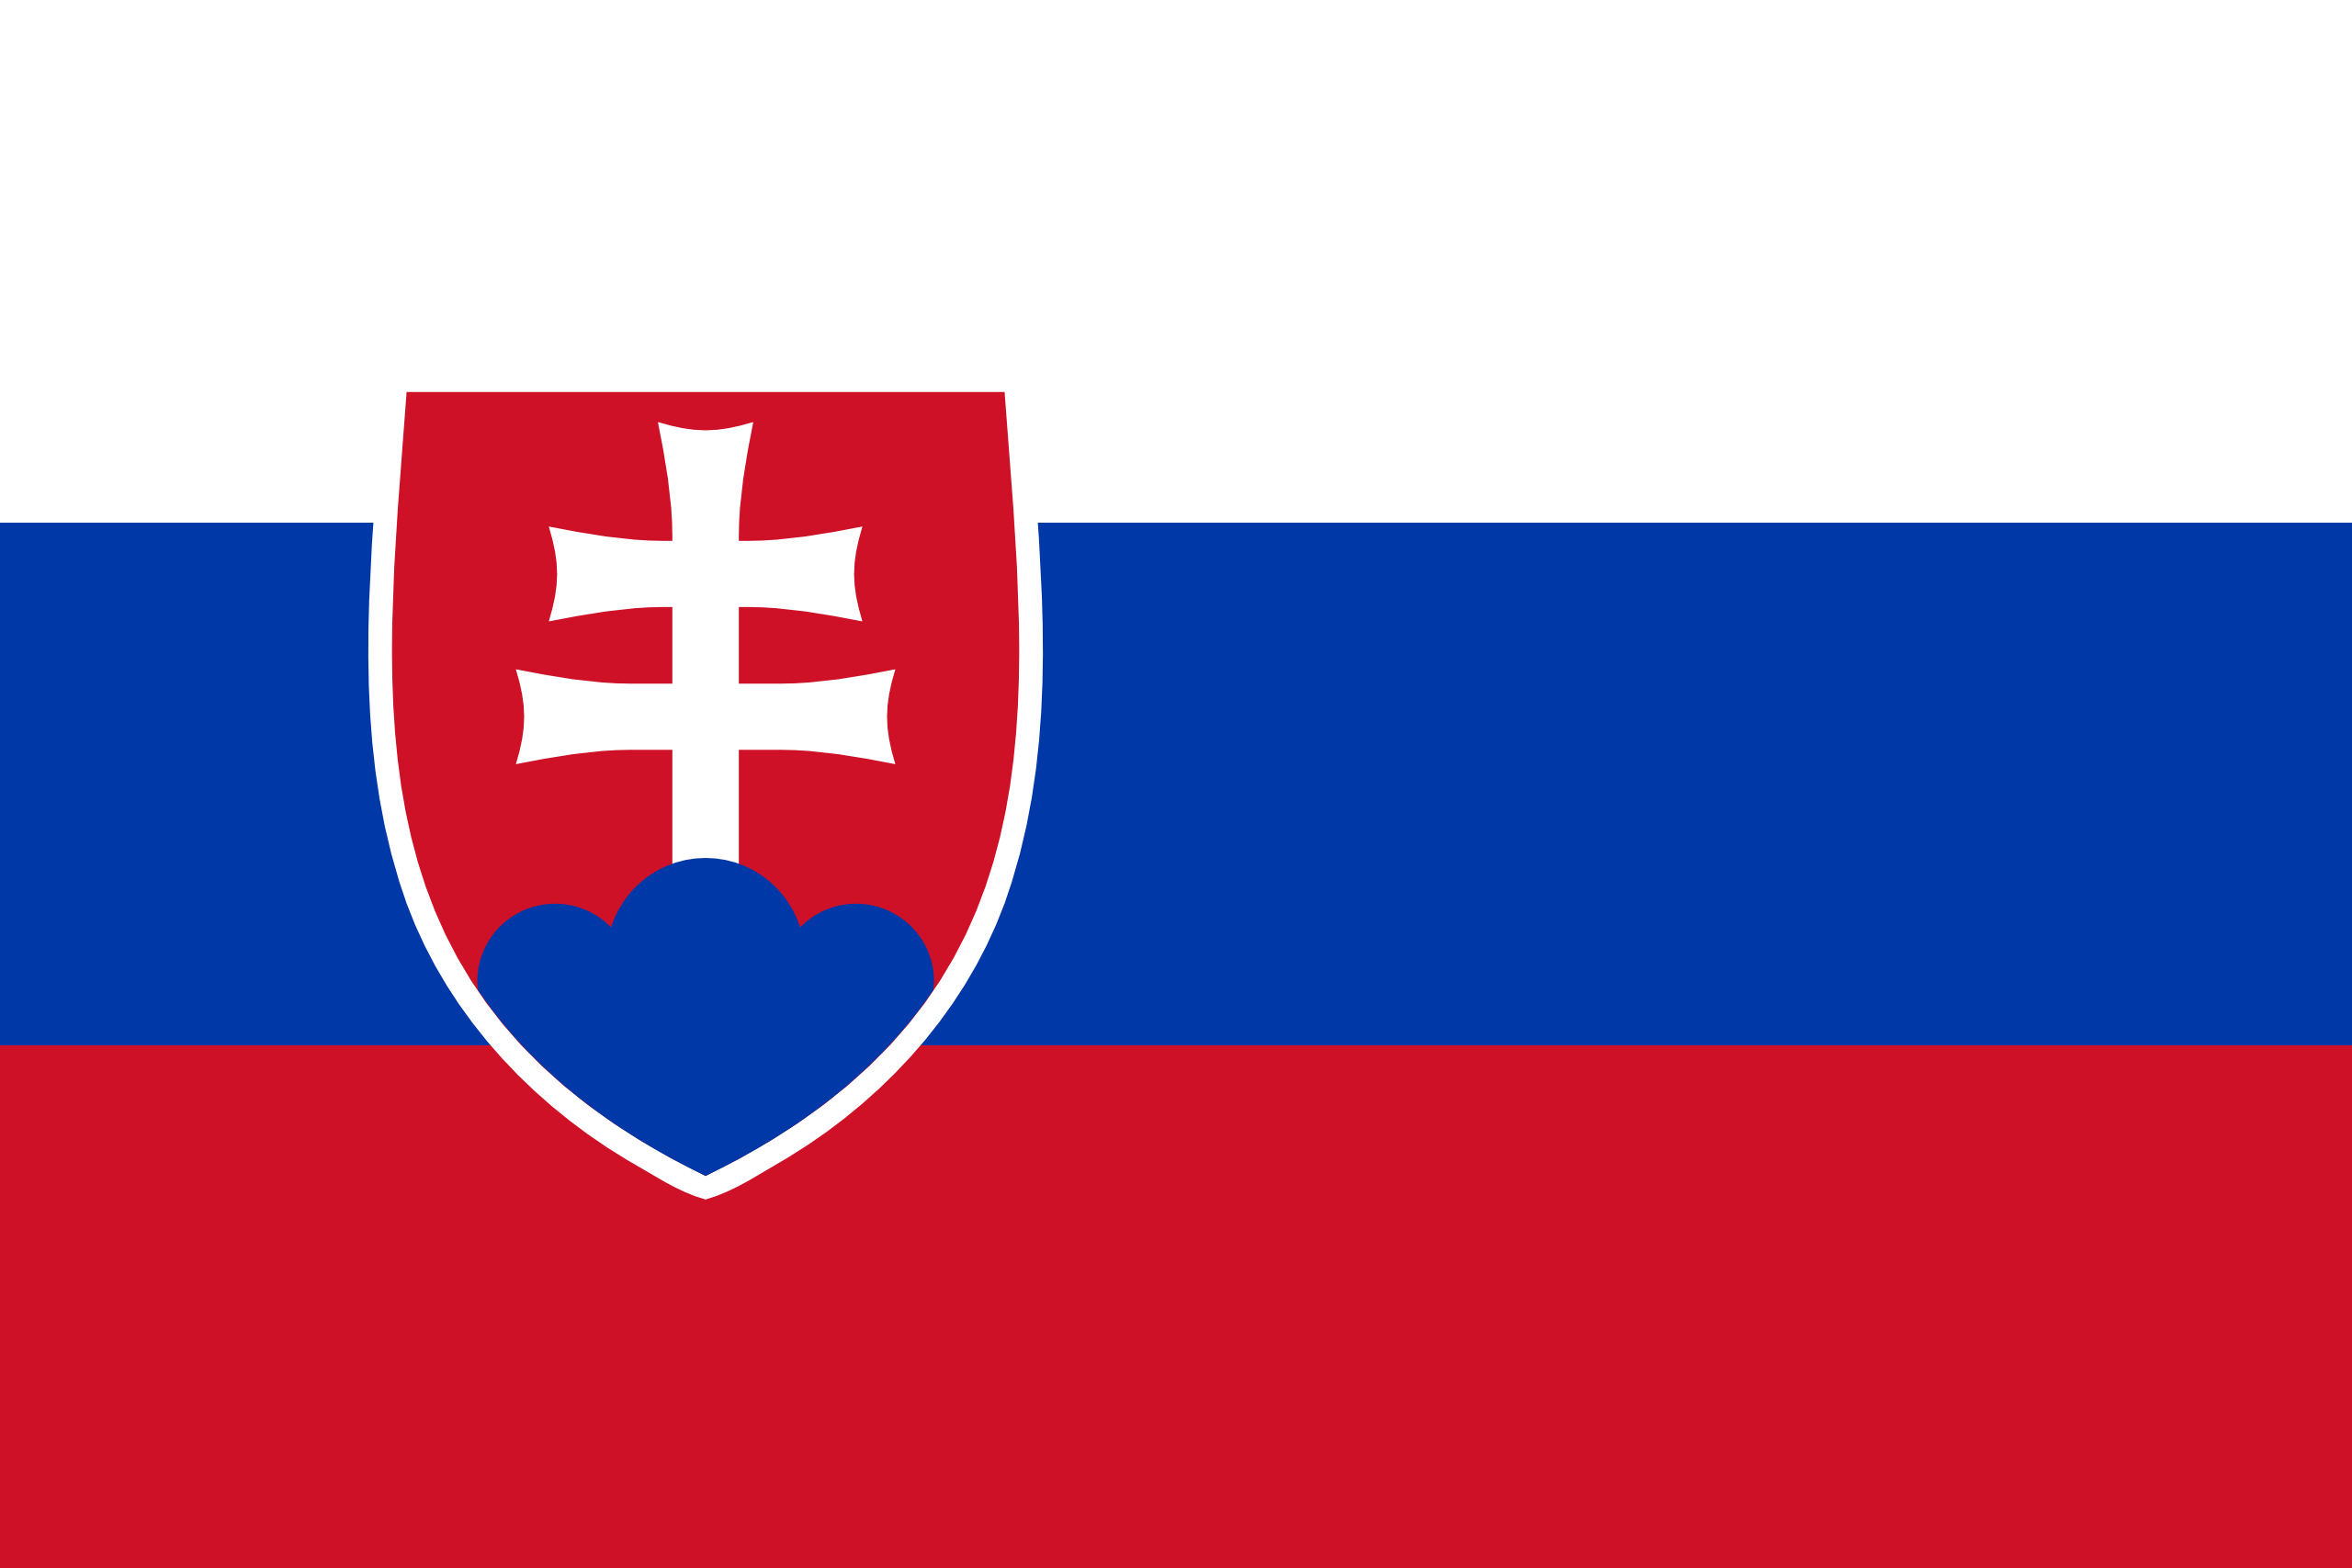 eslovaquia, paese, emblema, logo, simbolo - Sfondi HD - Professor-falken.com